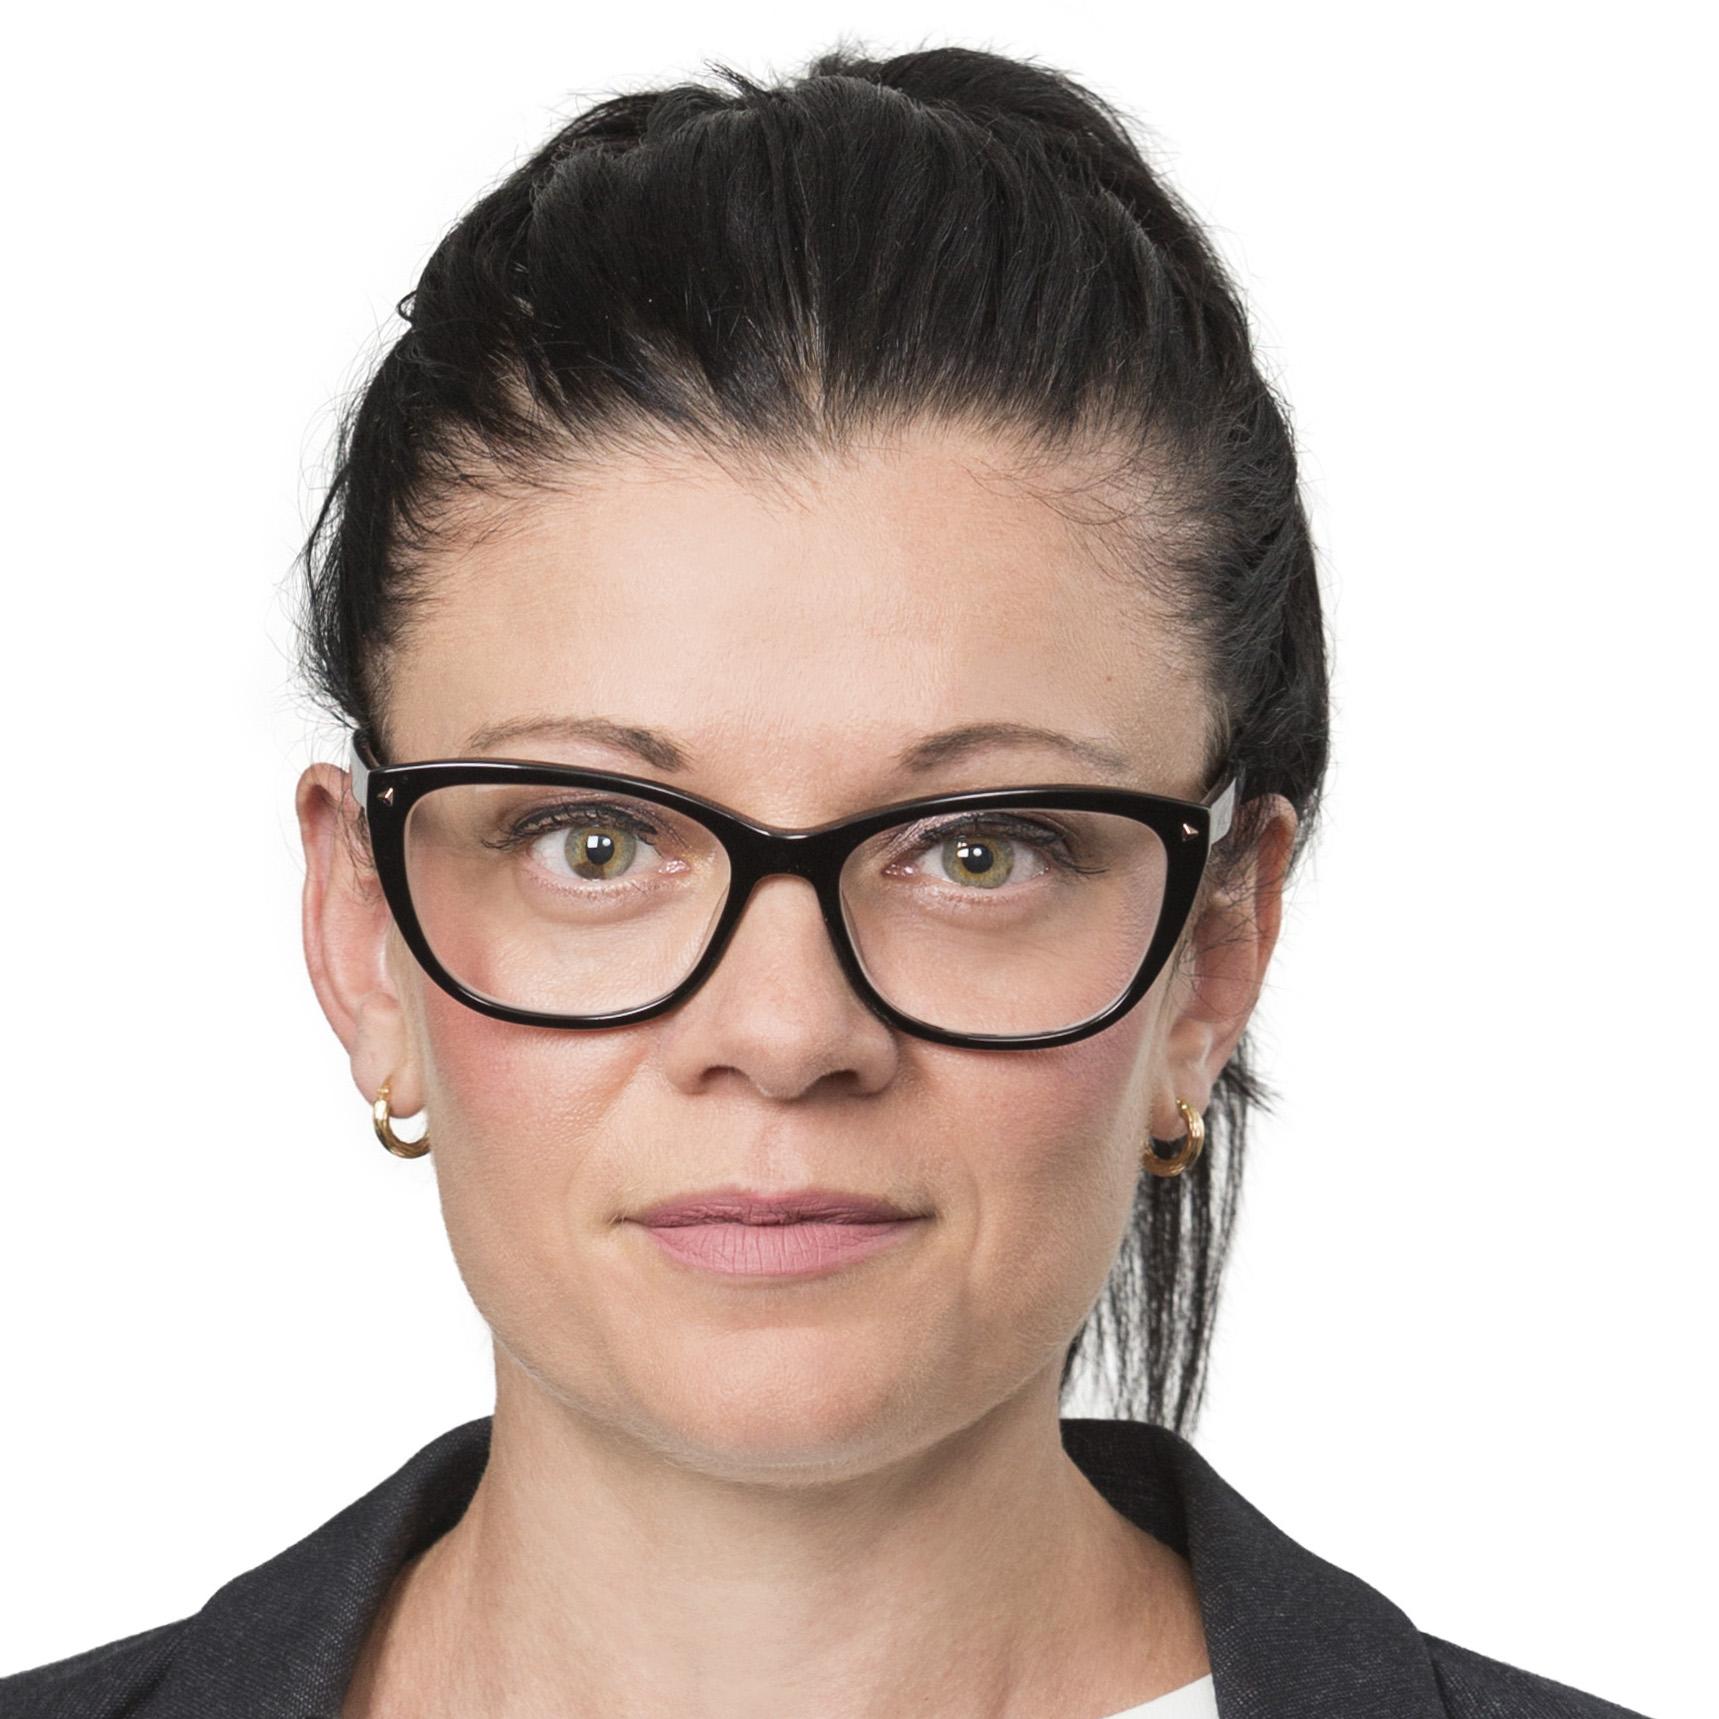 Cassandra Banks